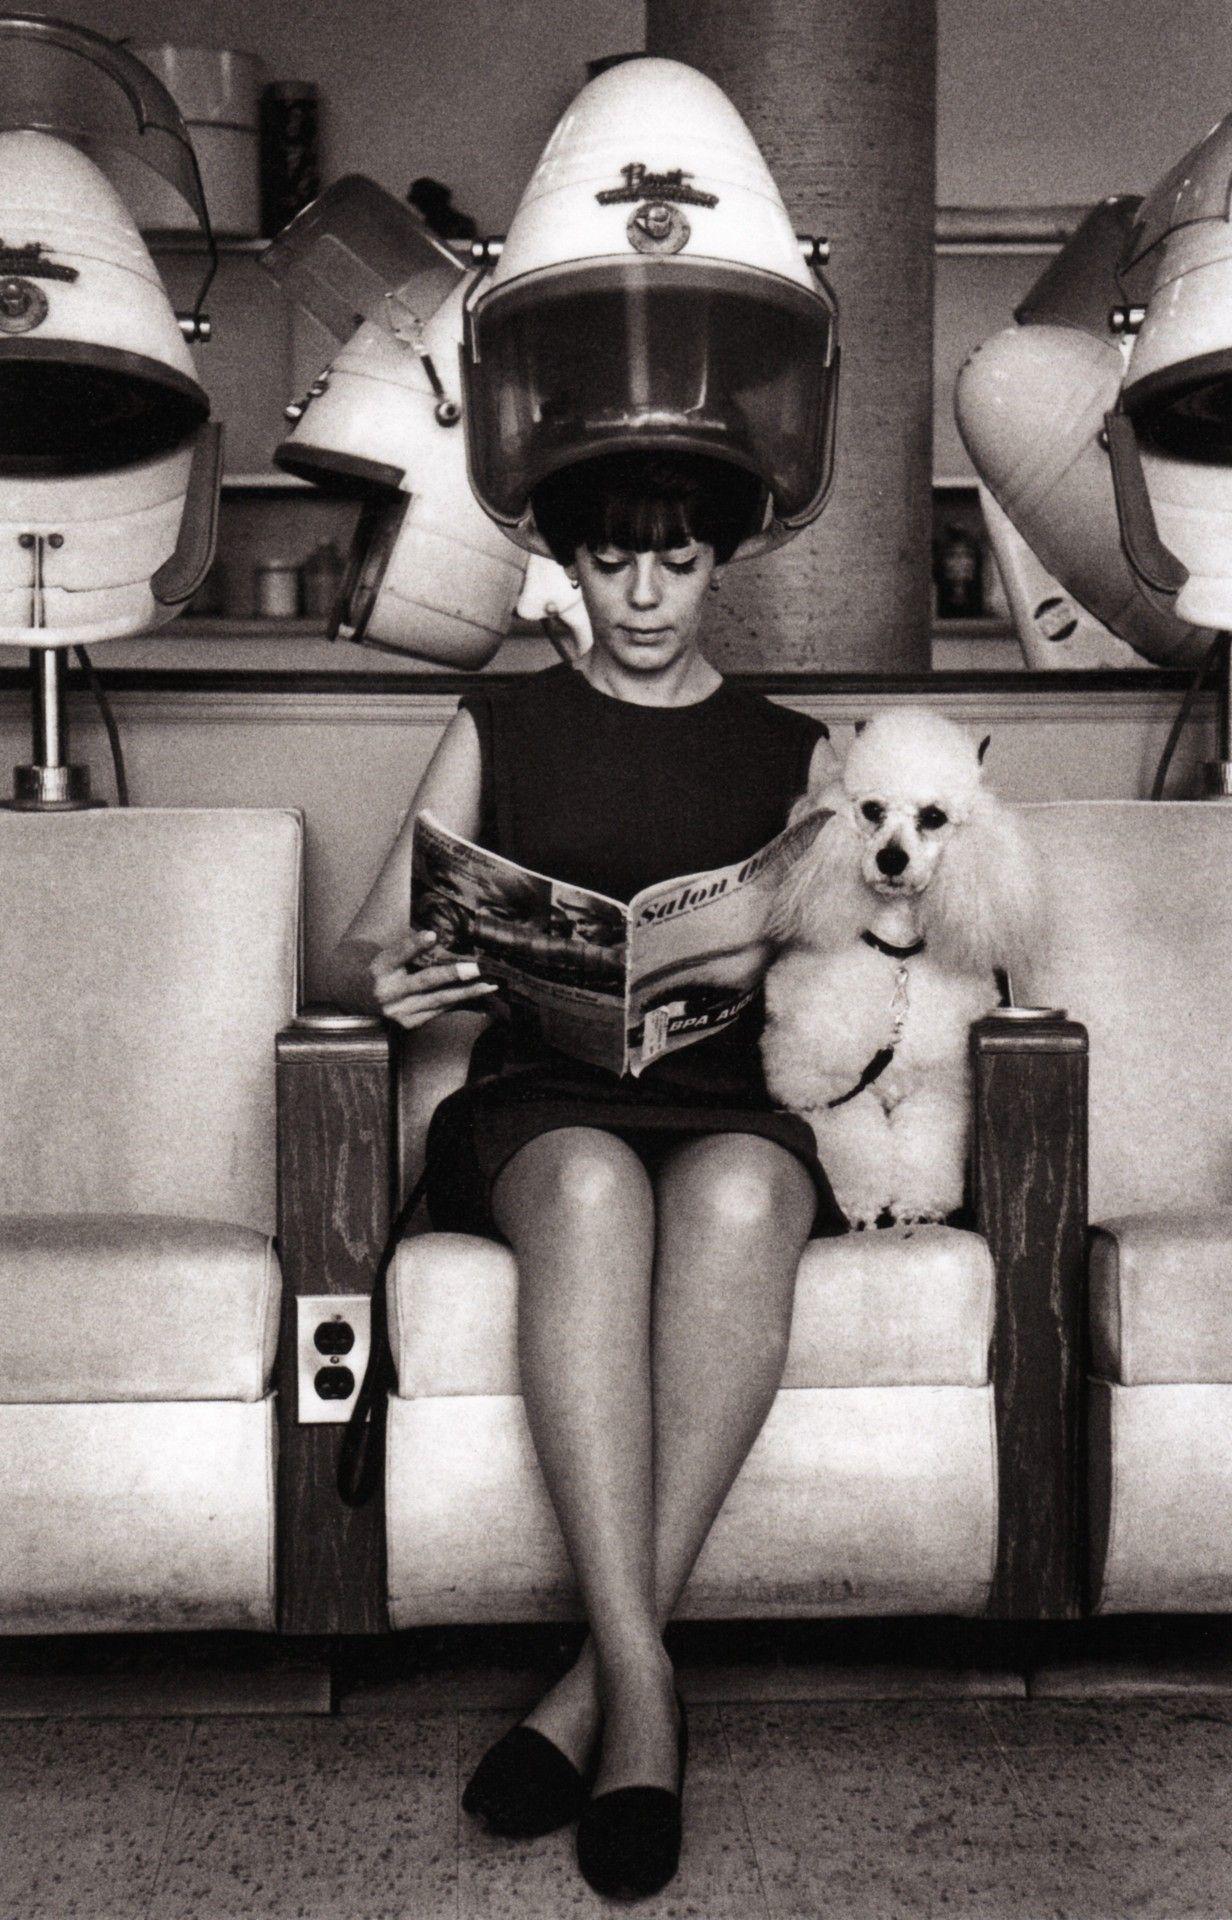 New York City, c. 1965.